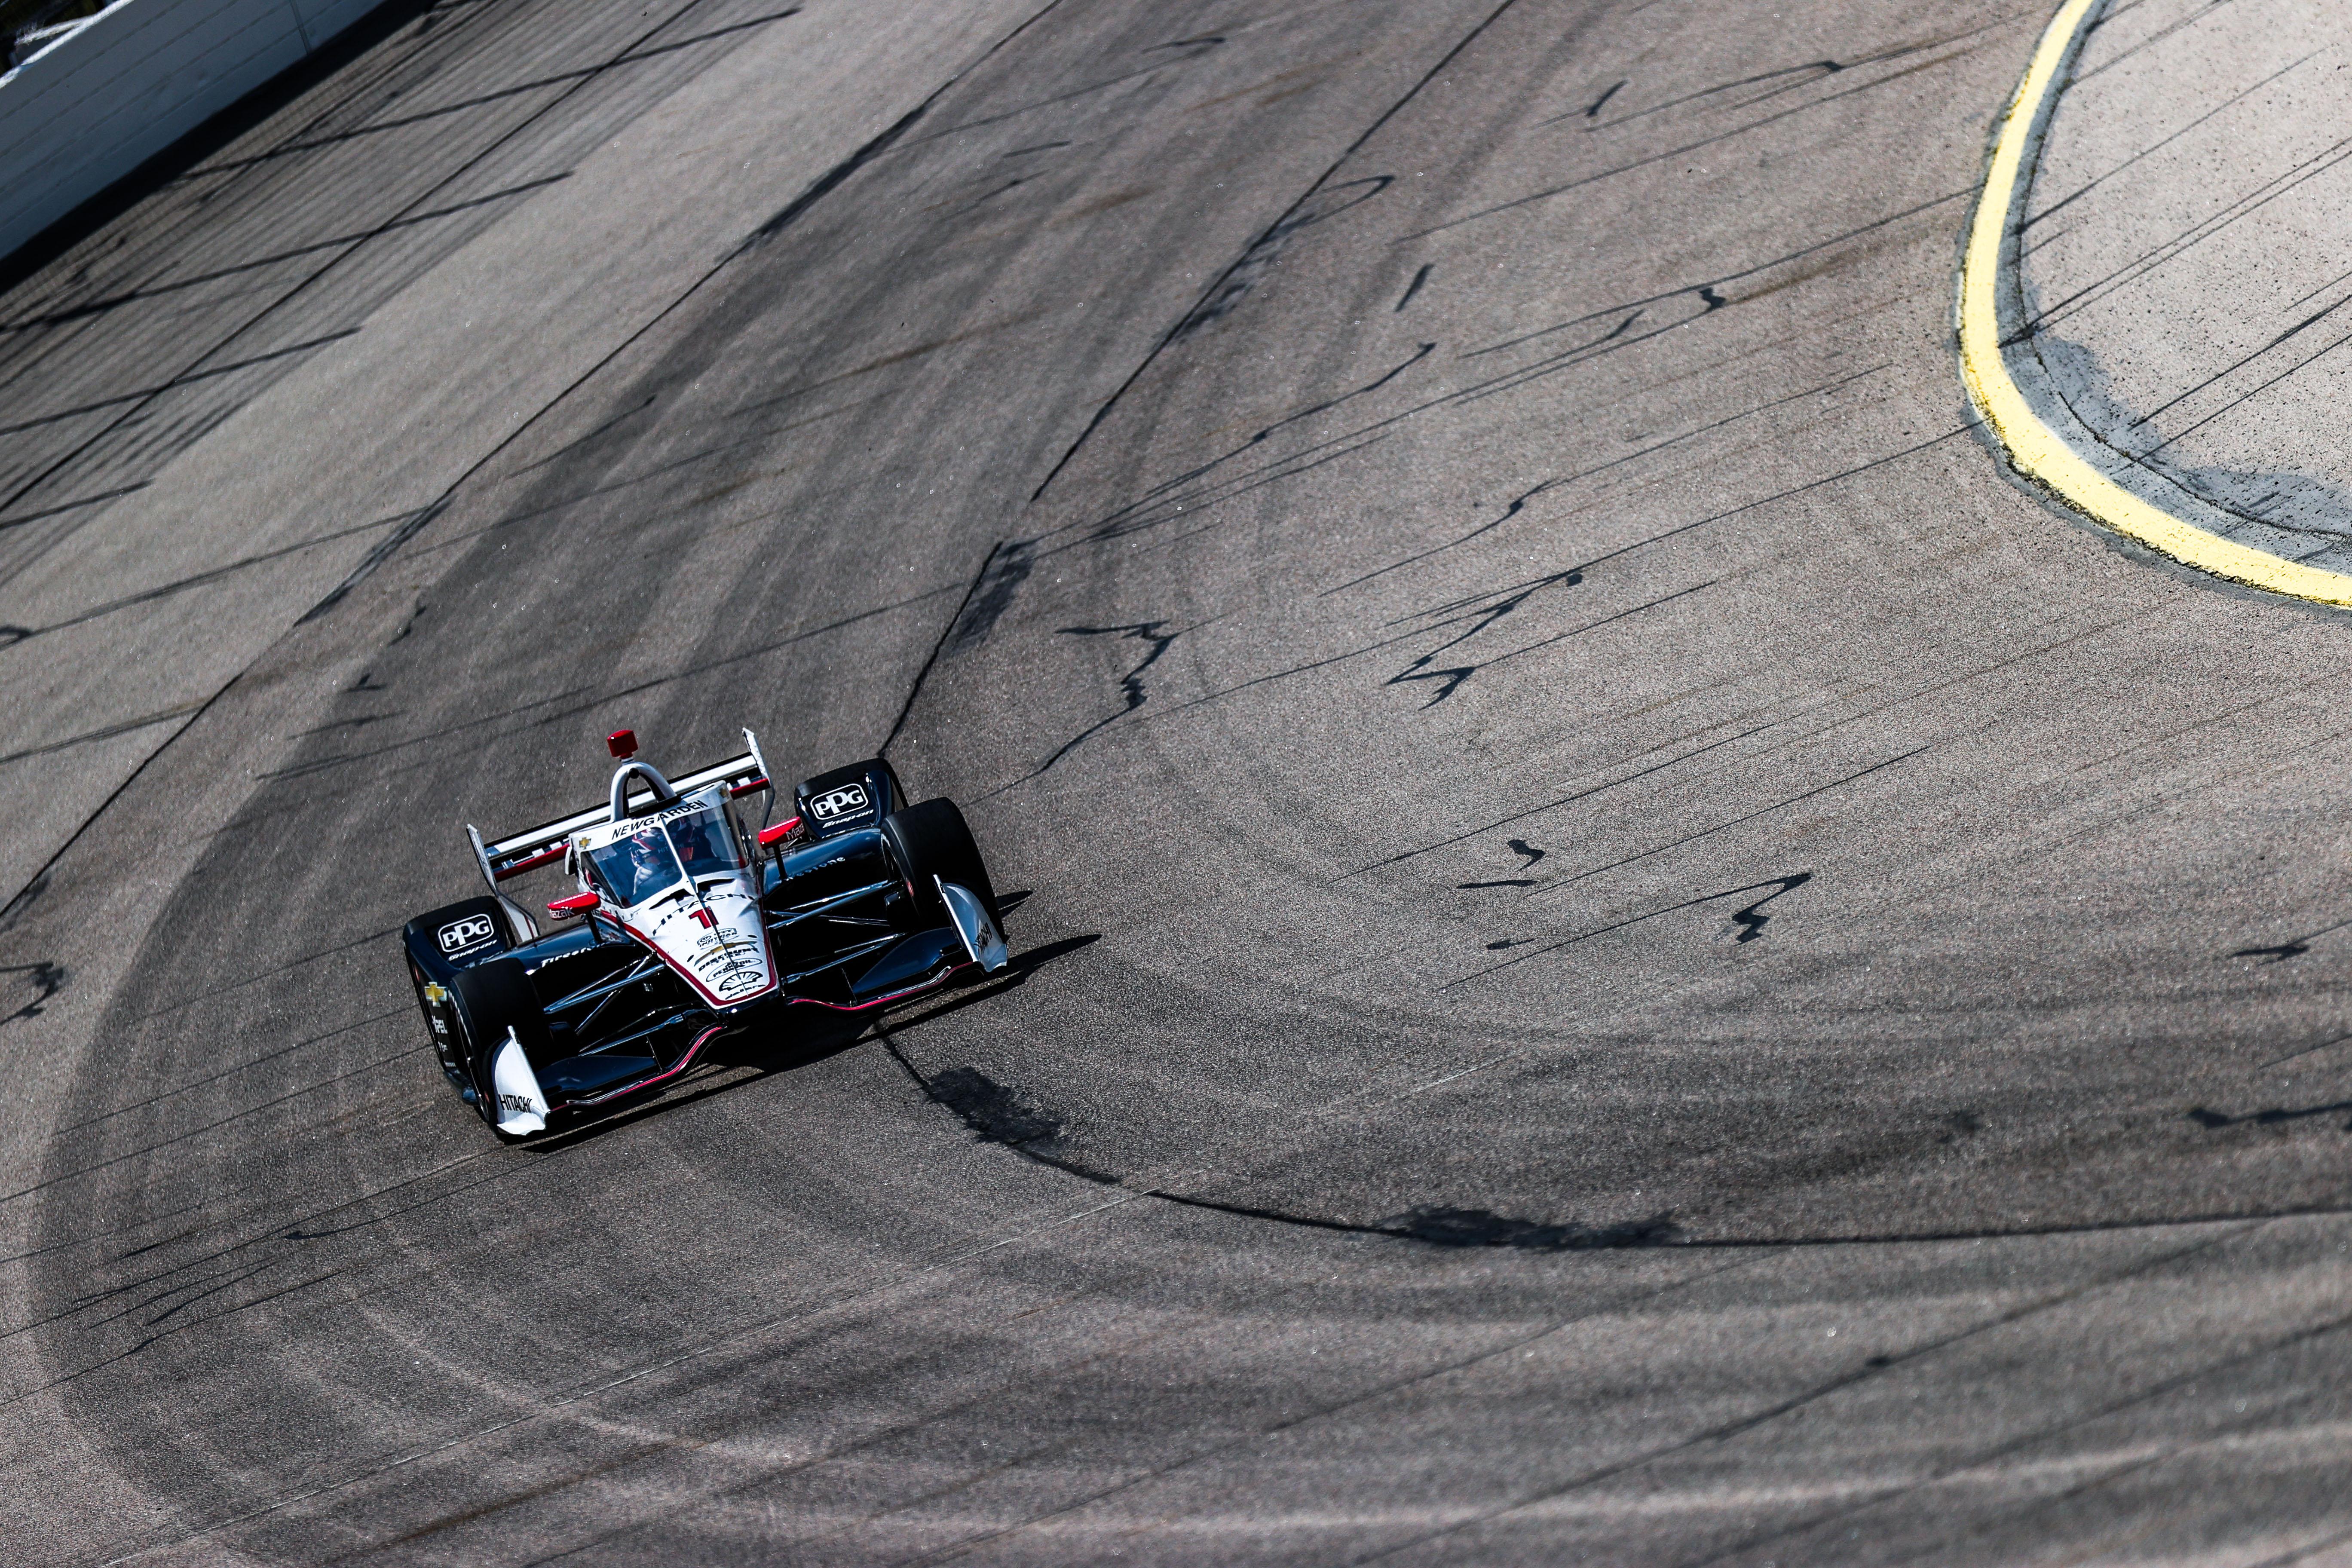 Josef Newgarden Penske Iowa IndyCar 2020